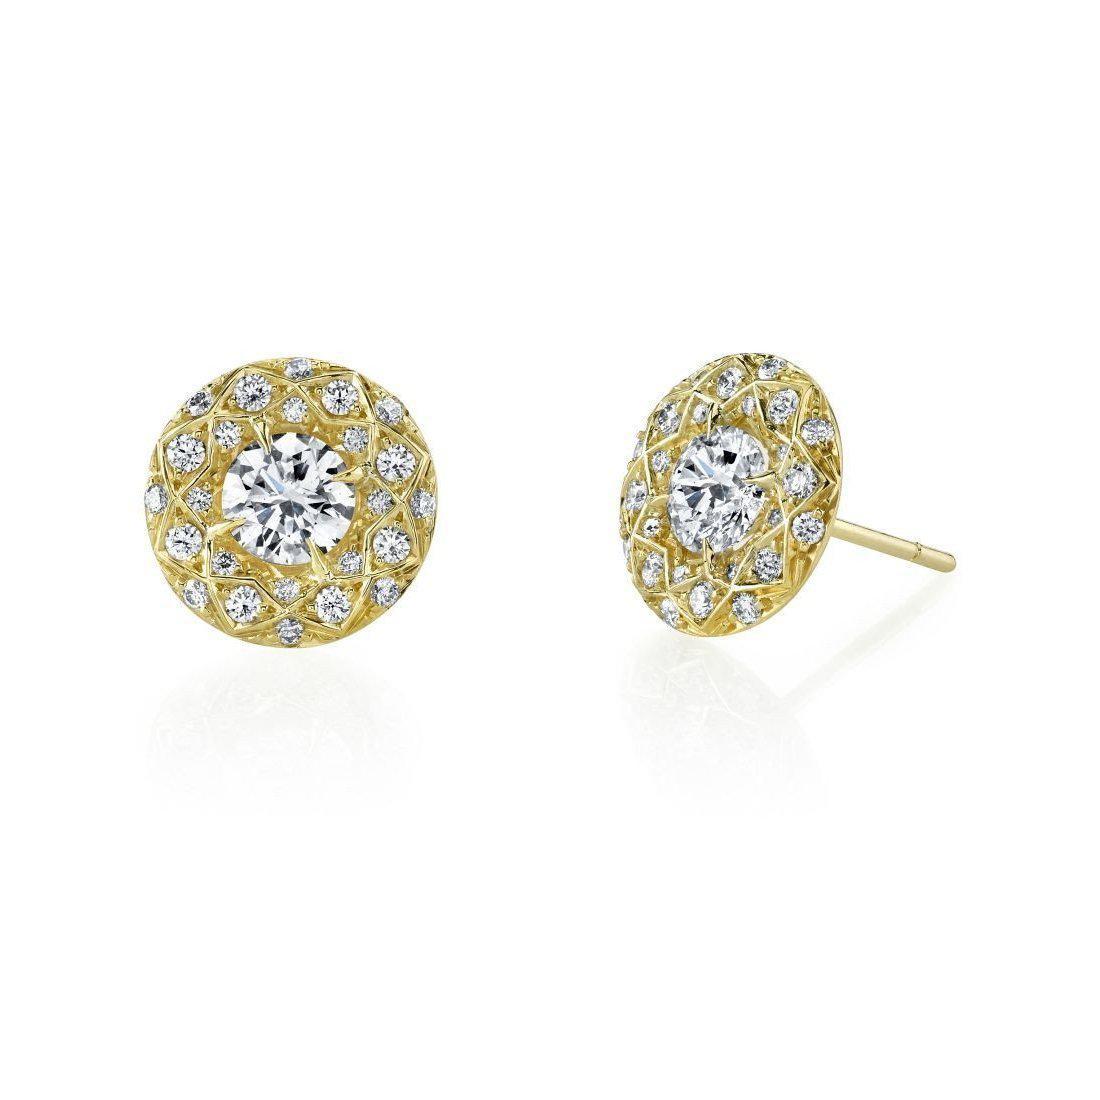 Harry Kotlar Luminesce Sapphire Stud Earrings tJw2U0Y